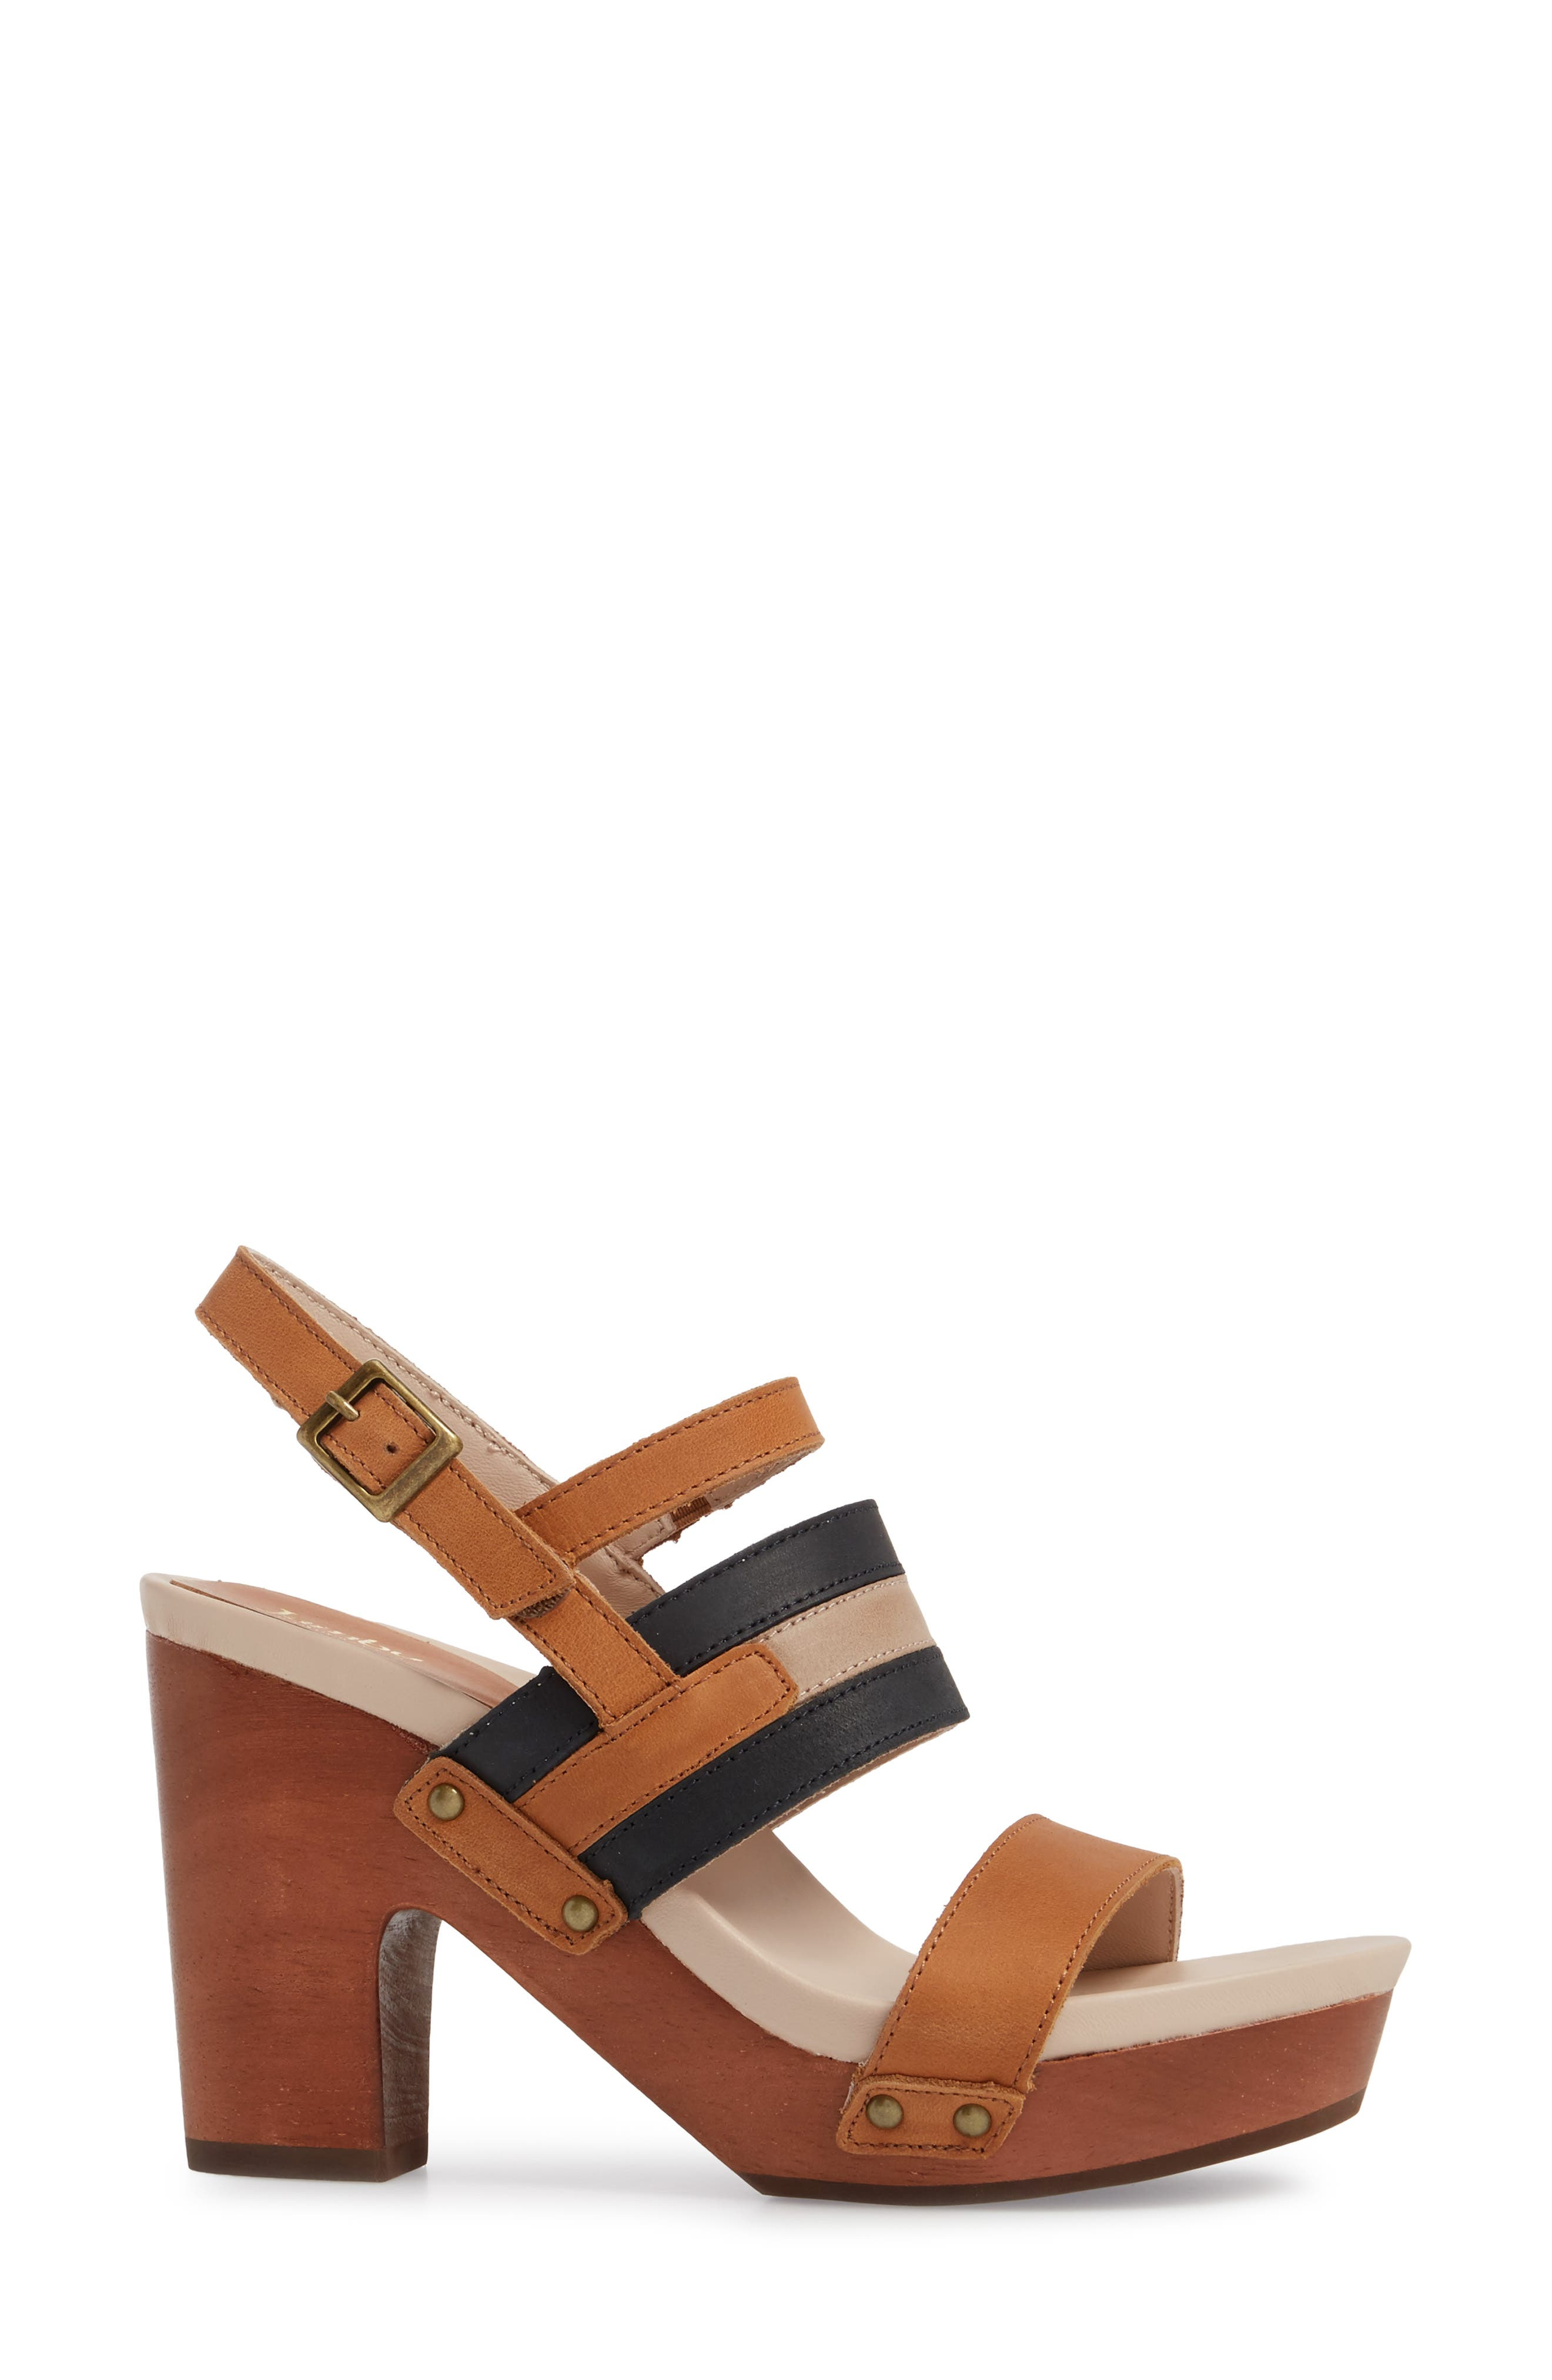 Viola Platform Sandal,                             Alternate thumbnail 3, color,                             200